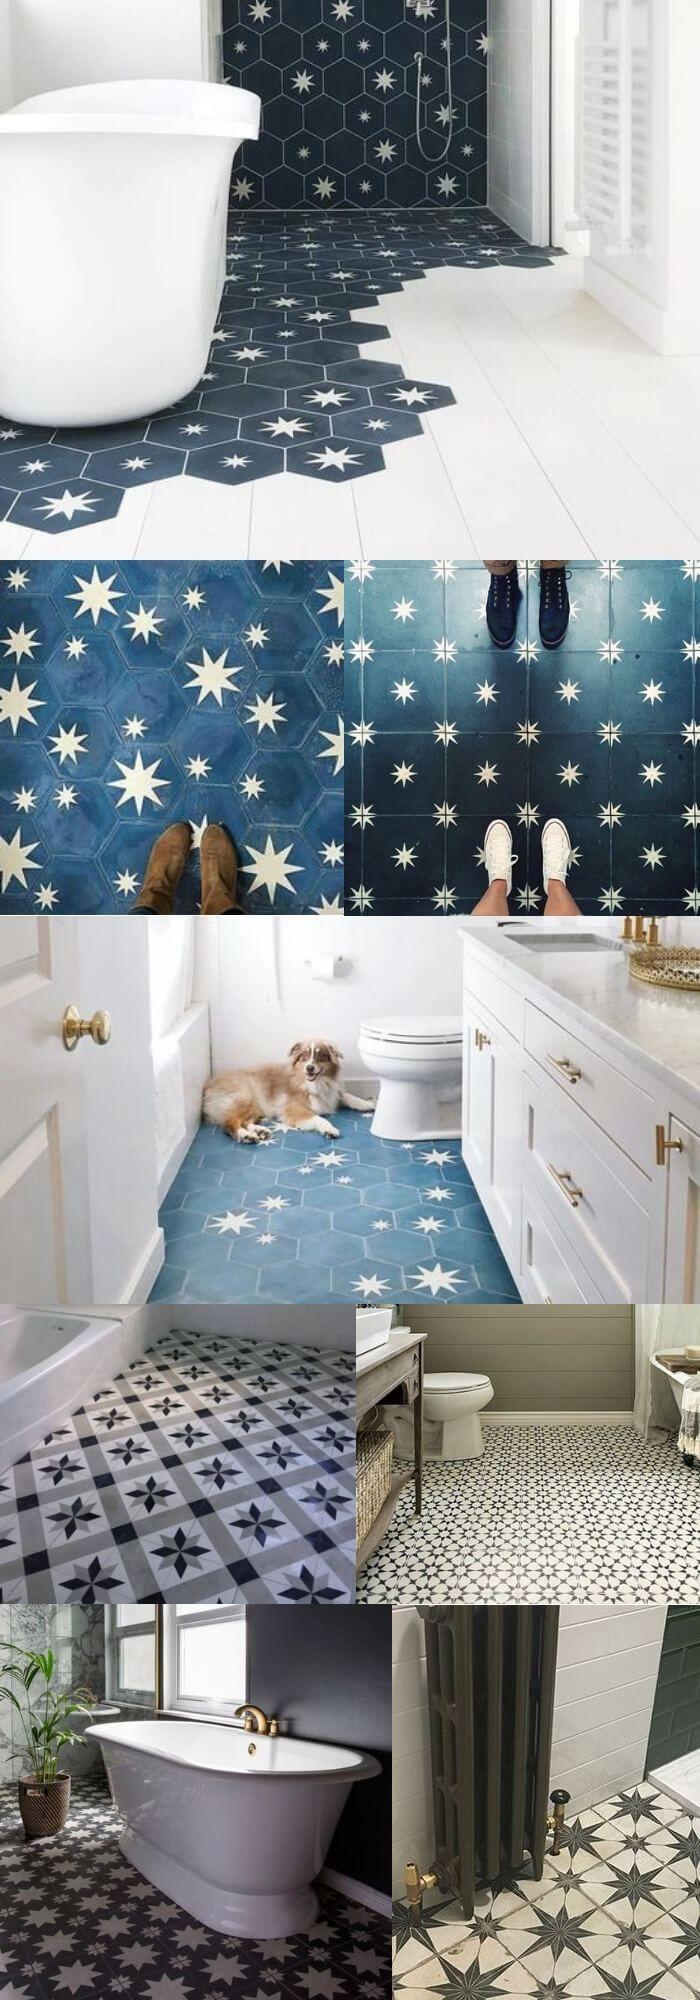 10 unique bathroom floor tile designs  ideas for 2020